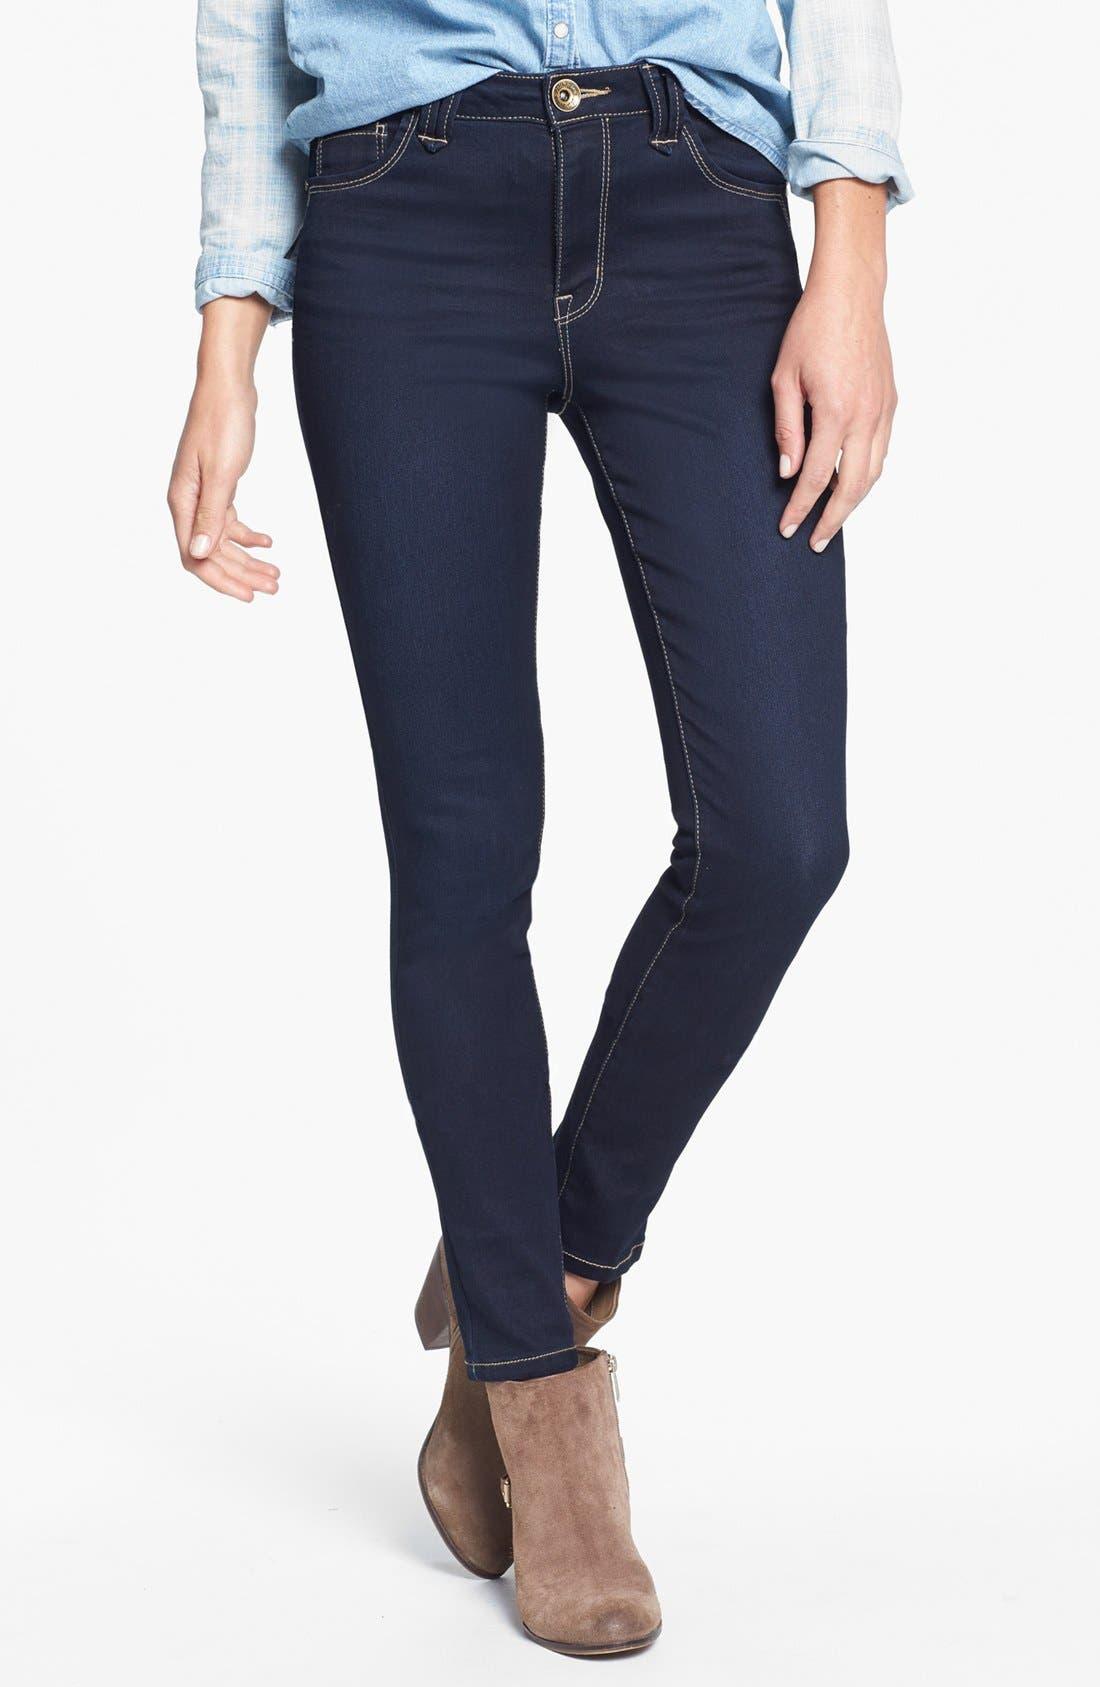 Main Image - Jolt High Waist Skinny Jeans (Dark) (Juniors)